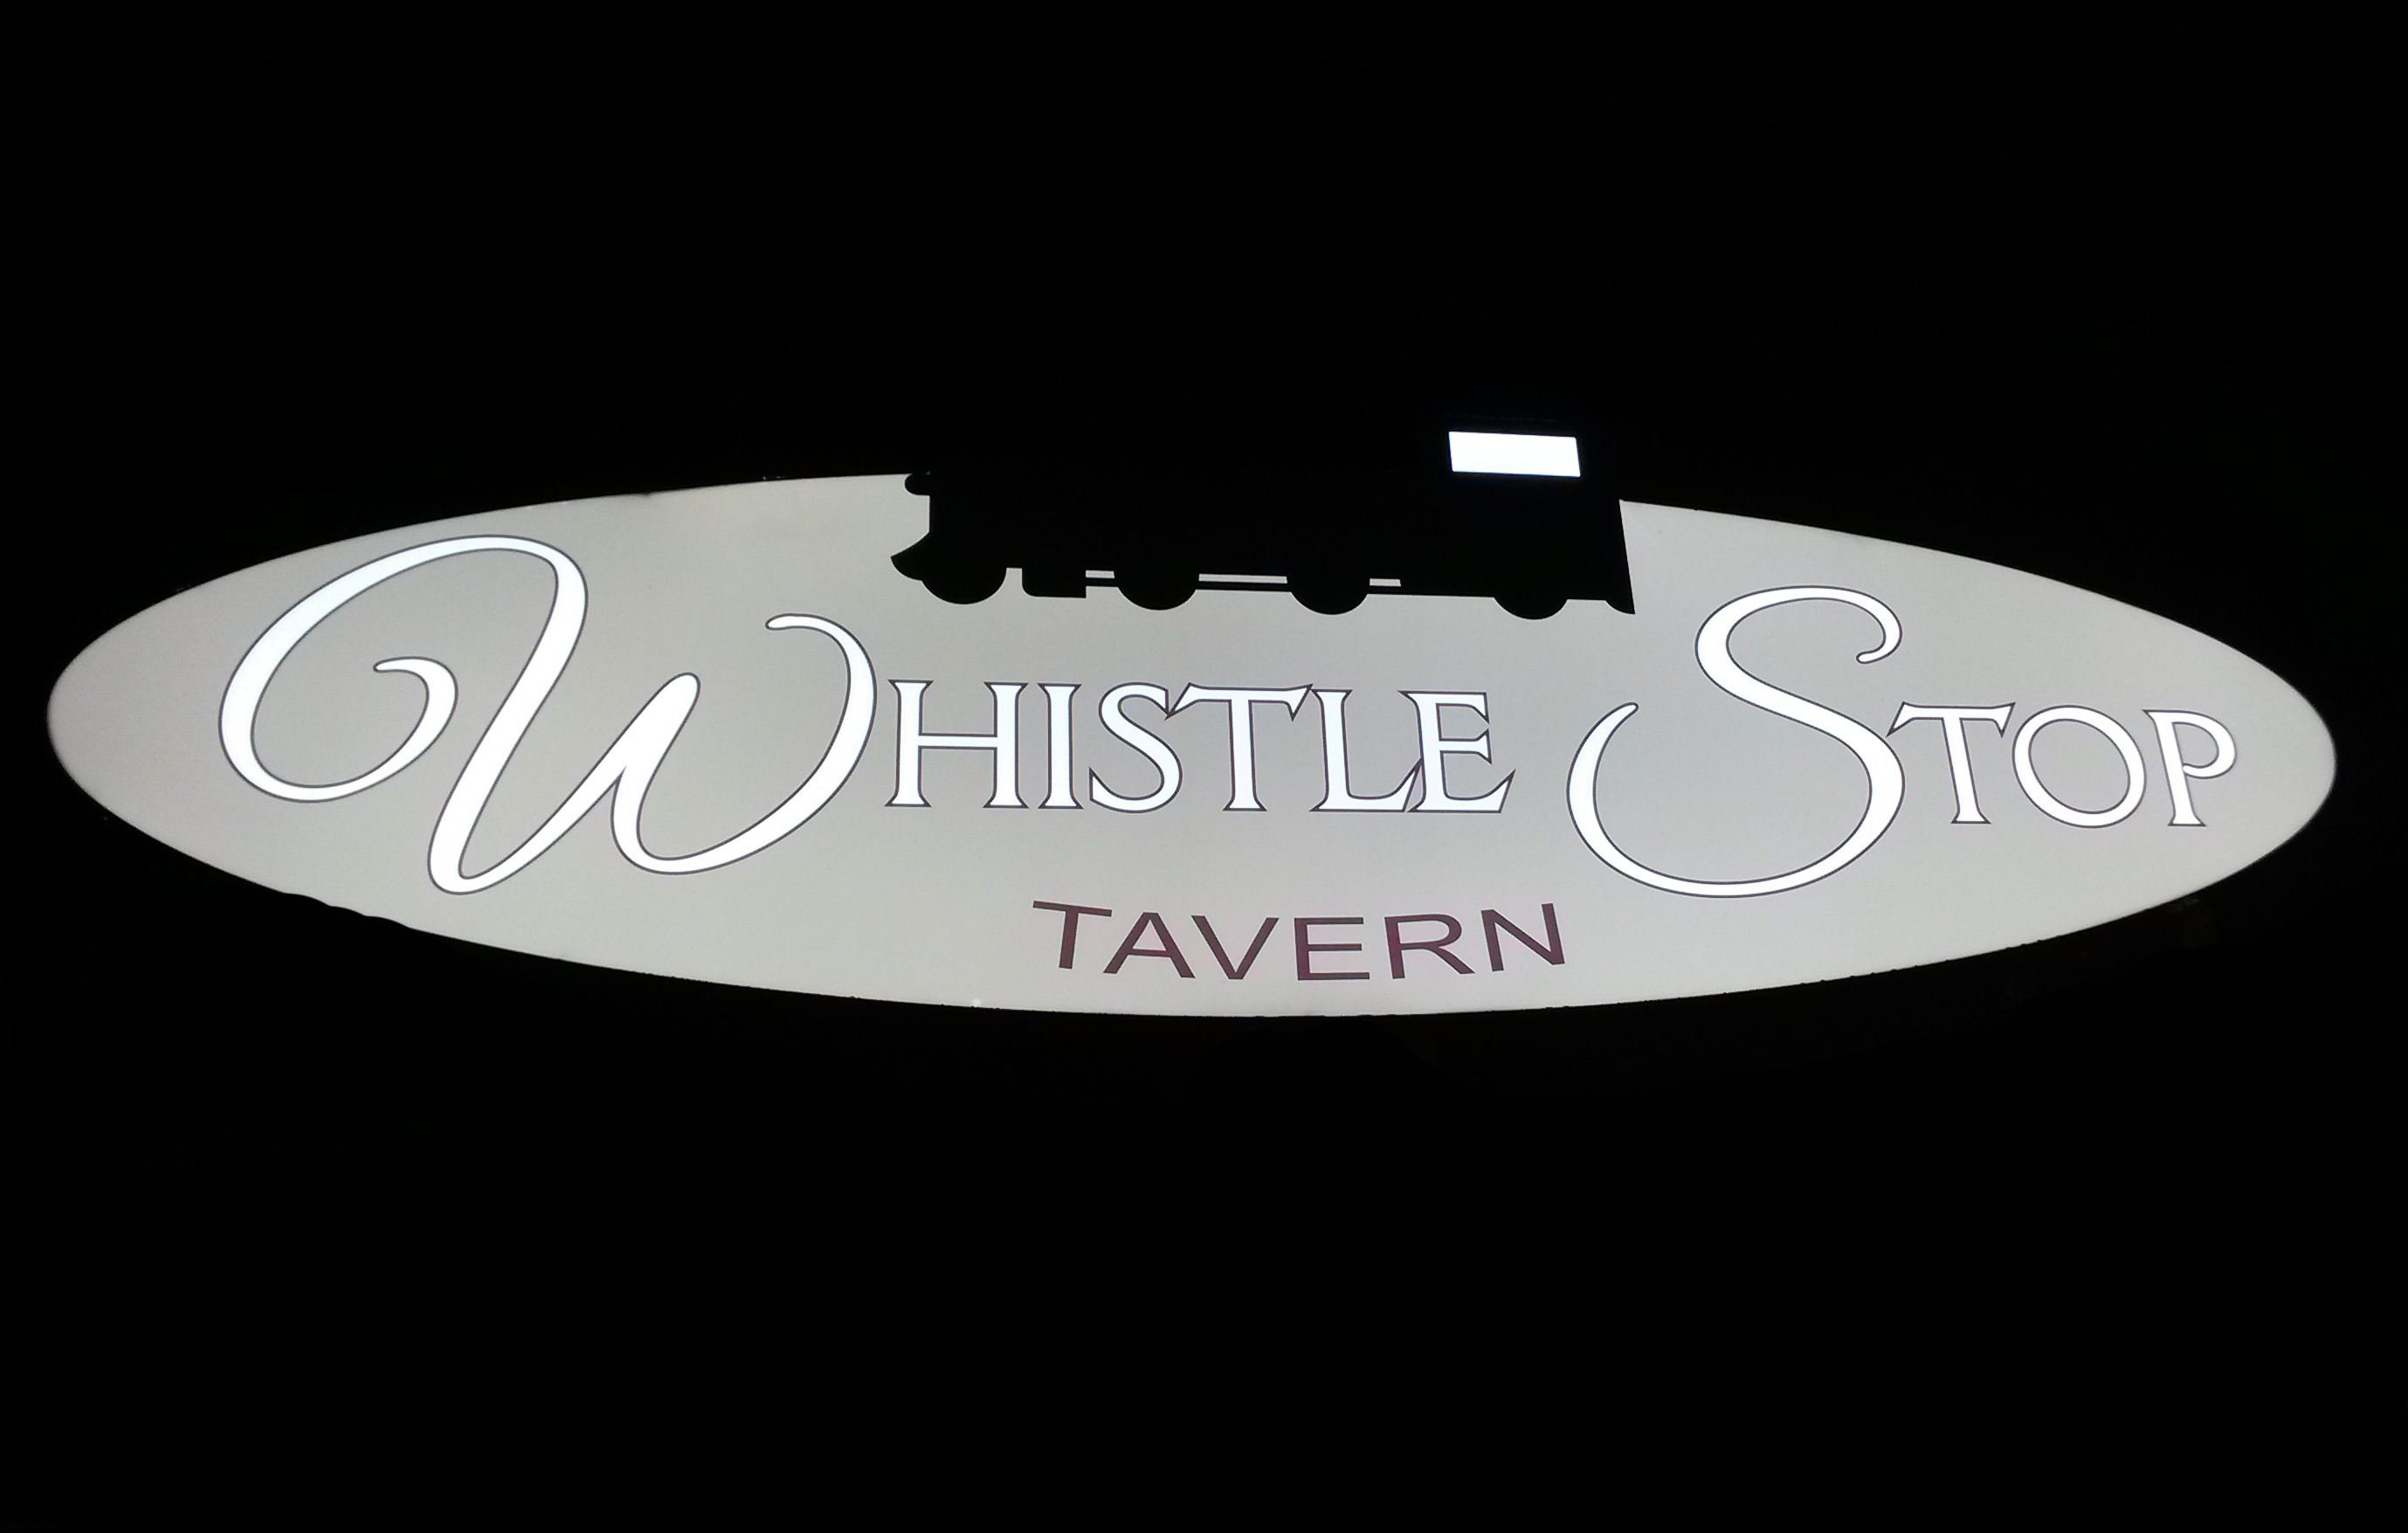 The Whistle Stop Tavern - Lantana Webpagedepot